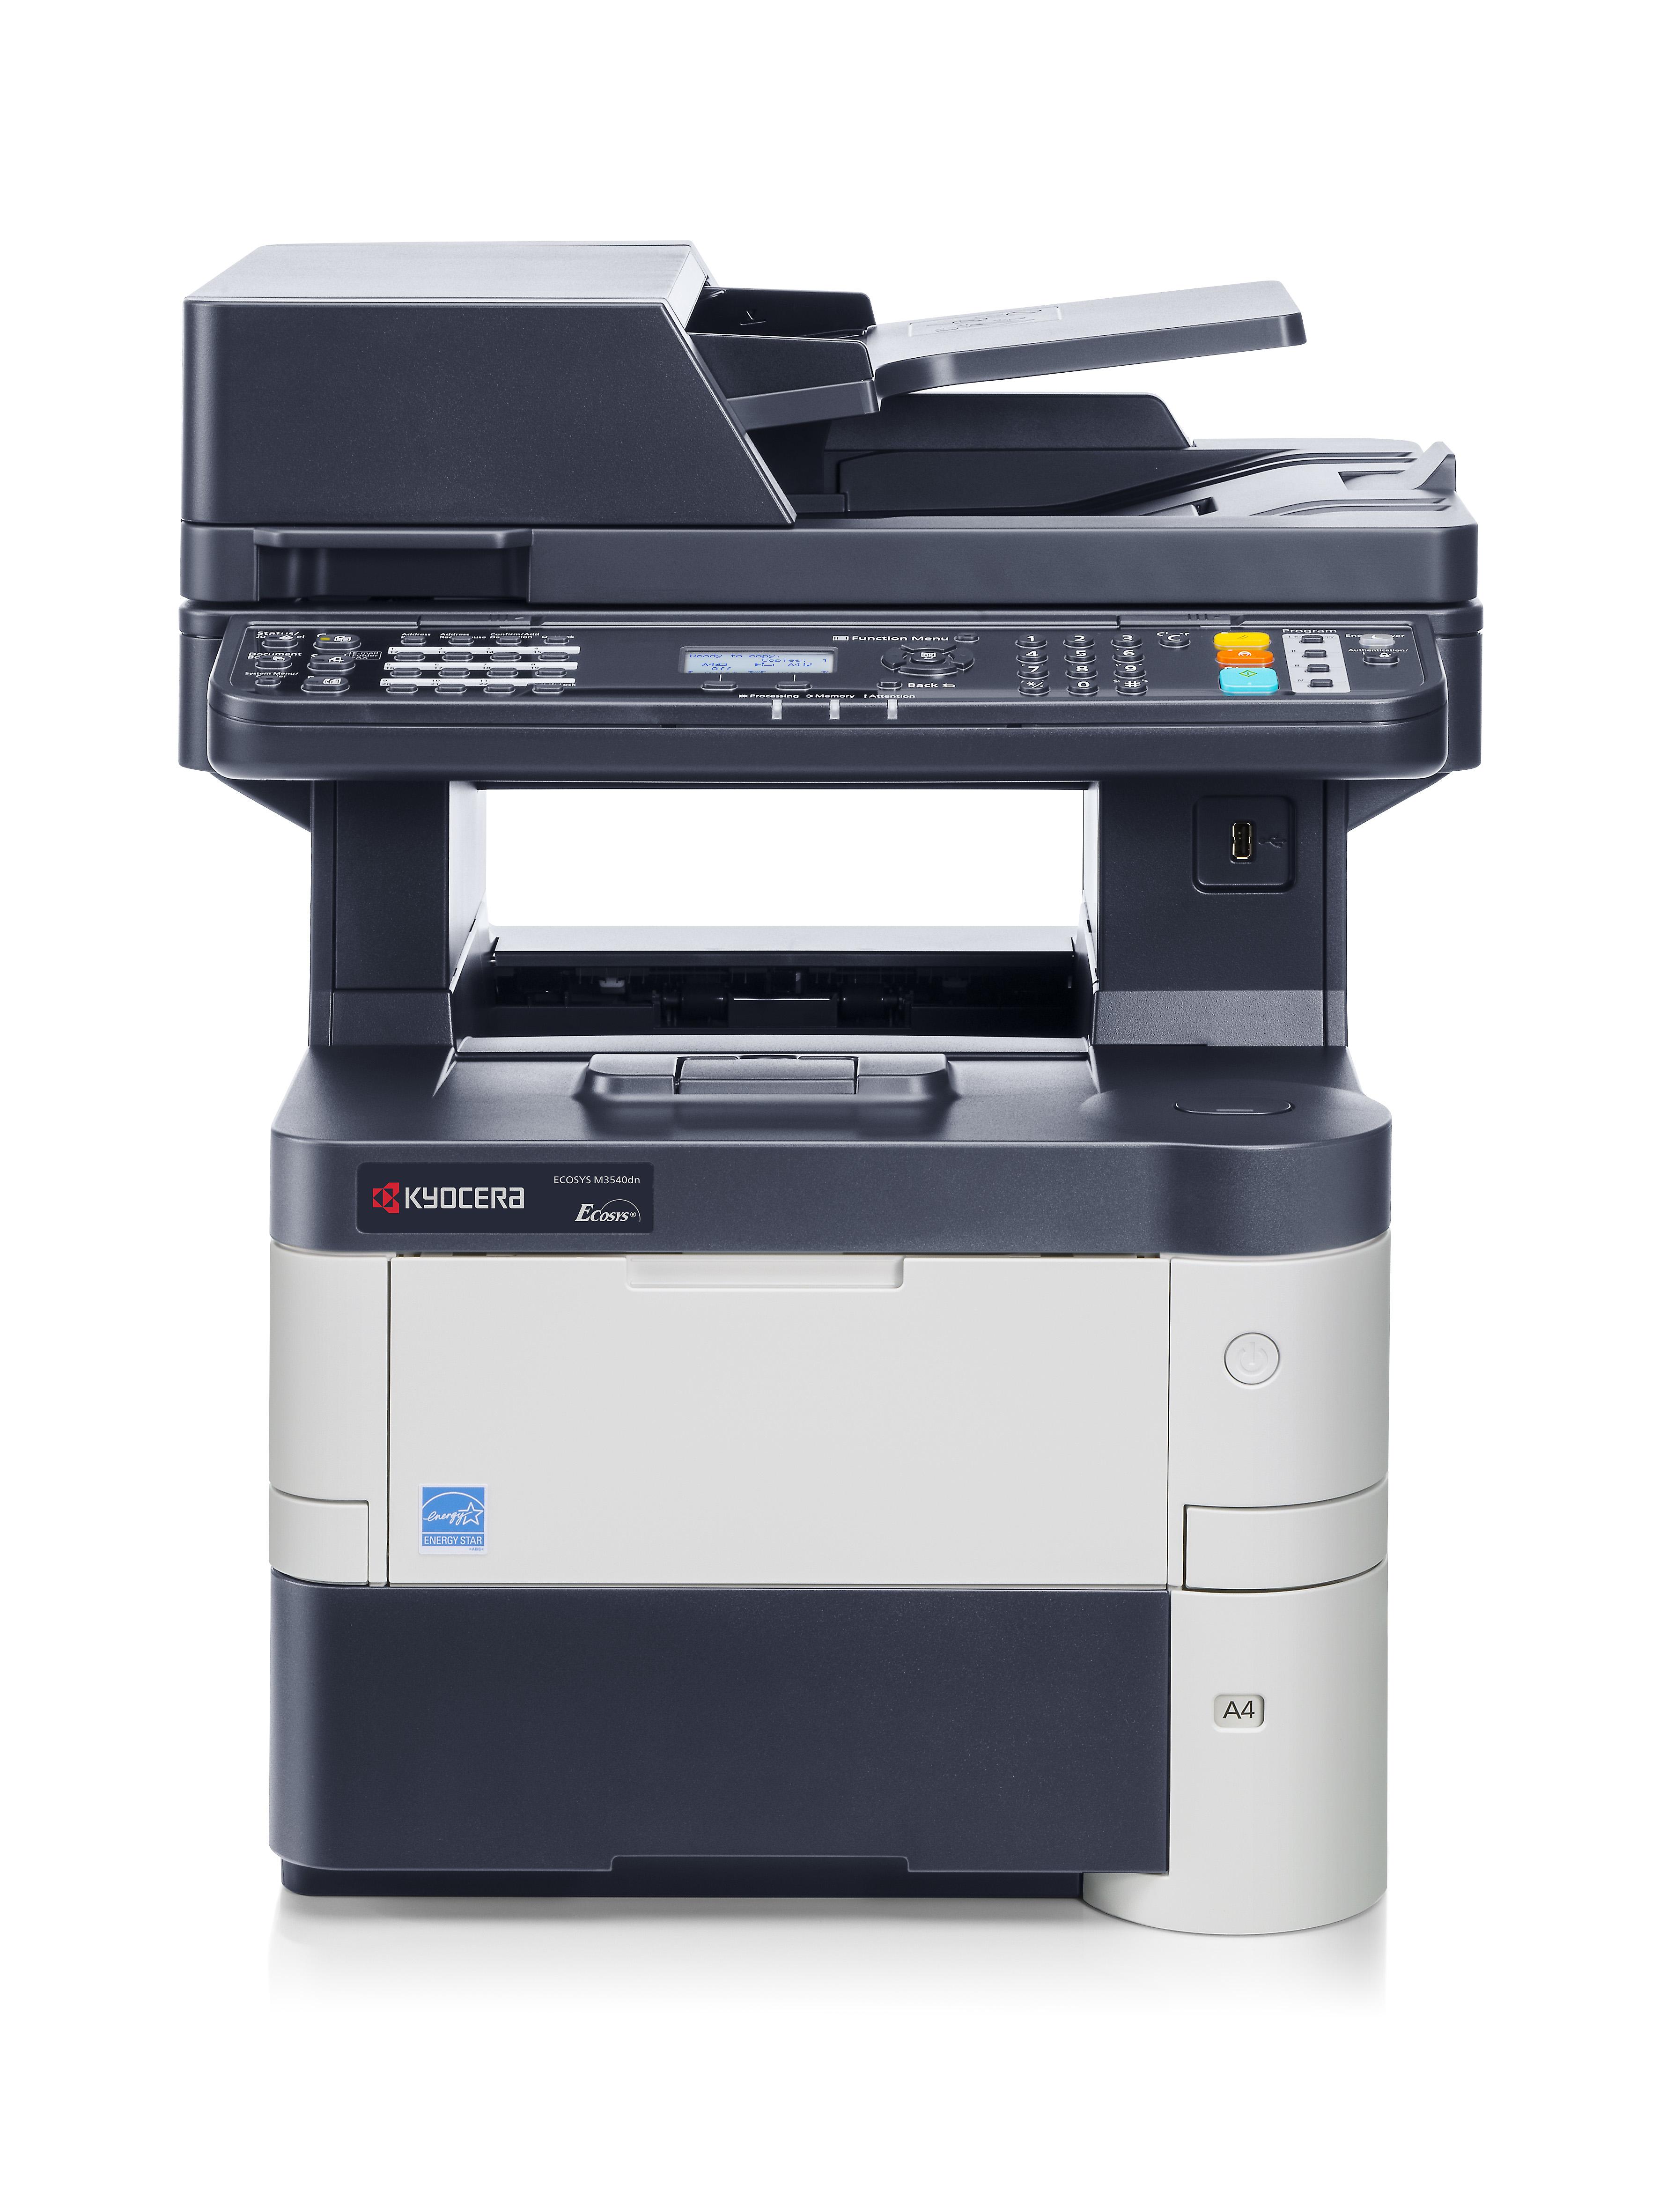 Kyocera ECOSYS M3540dn - Multifunktionsdrucker - s/w